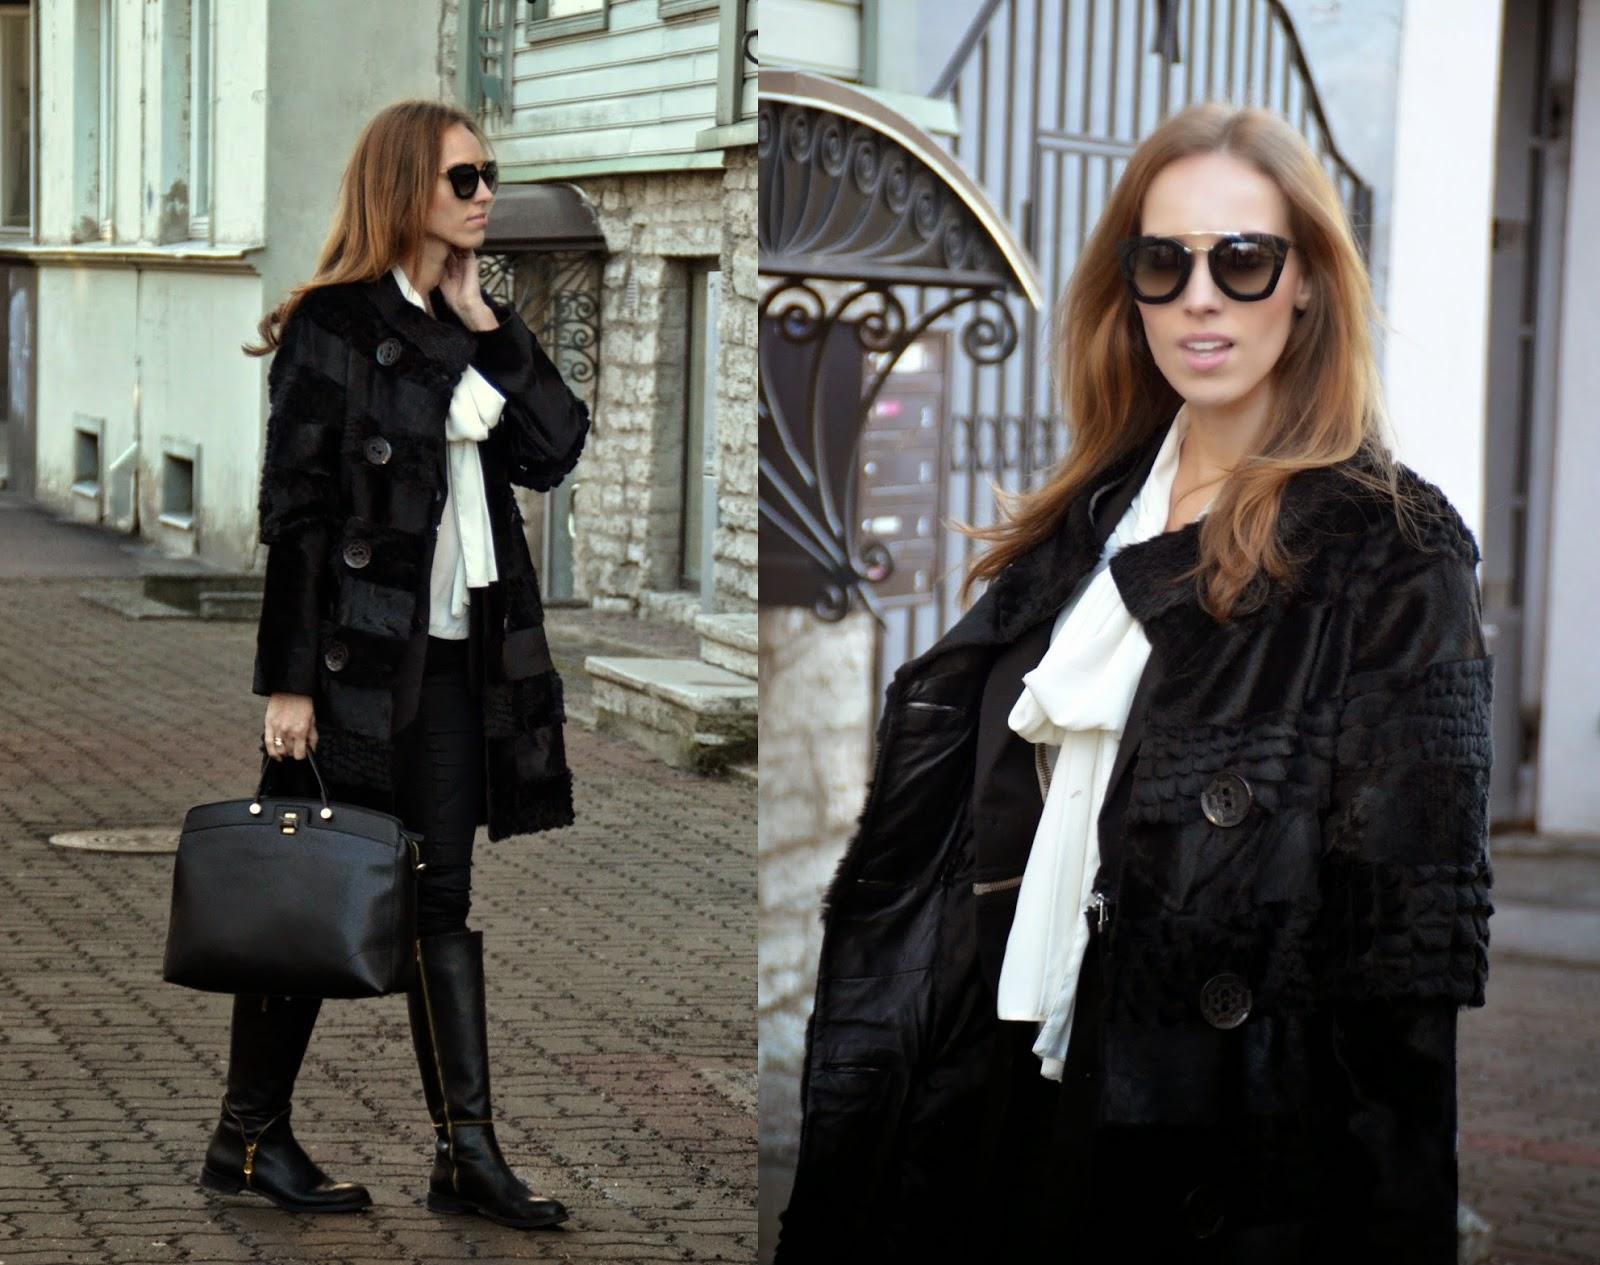 fur-coat-furla-black-bag-noa-boots-prada-sunglasses-asos-pussybow-blous